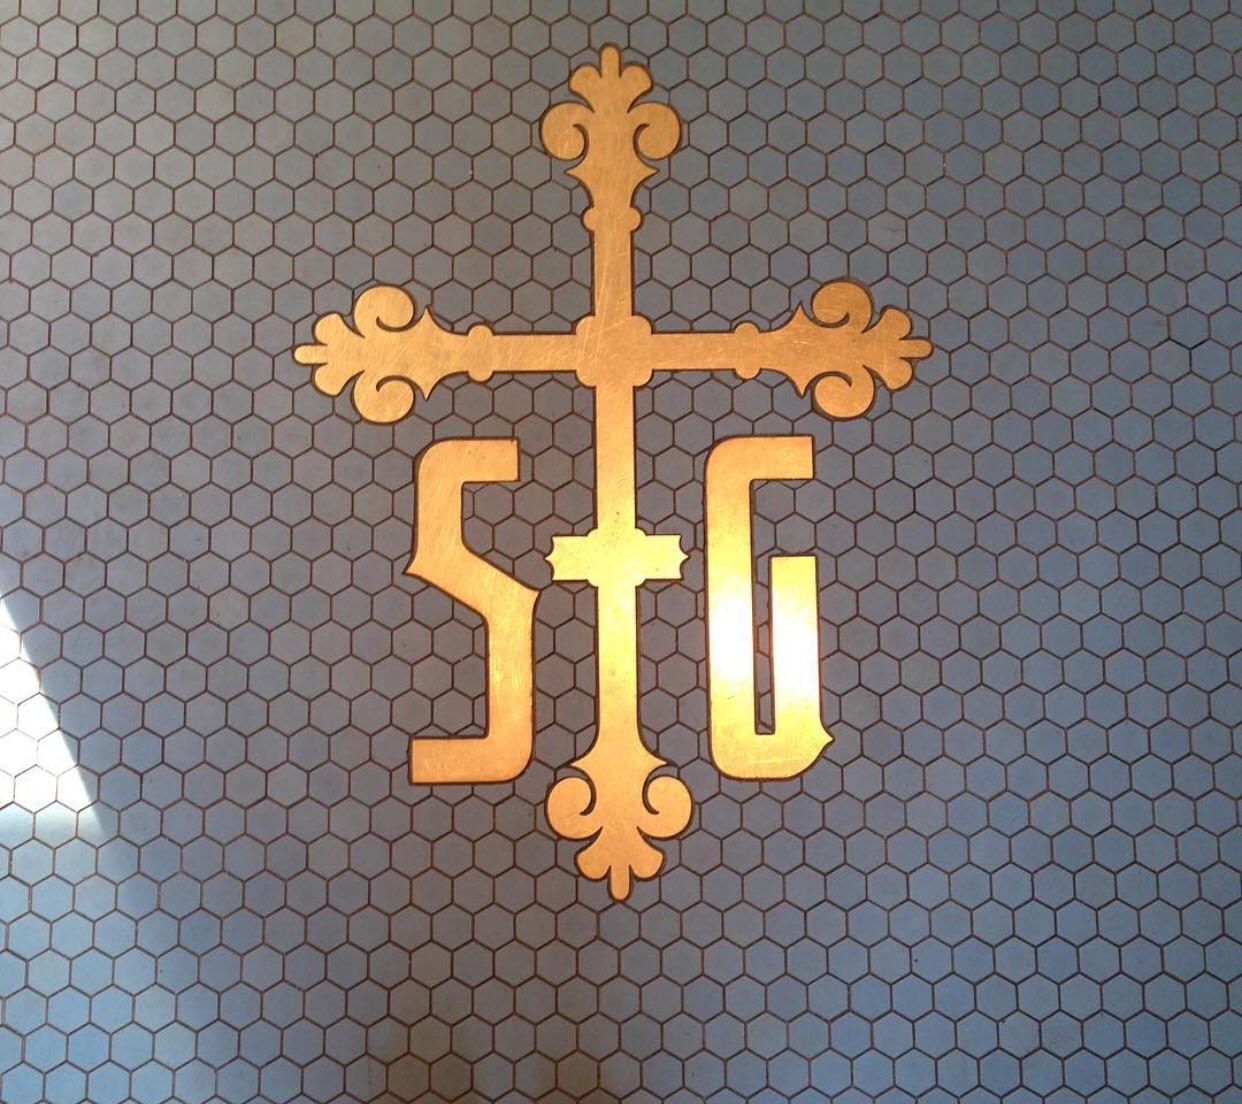 Welcome to Saint Genevieve